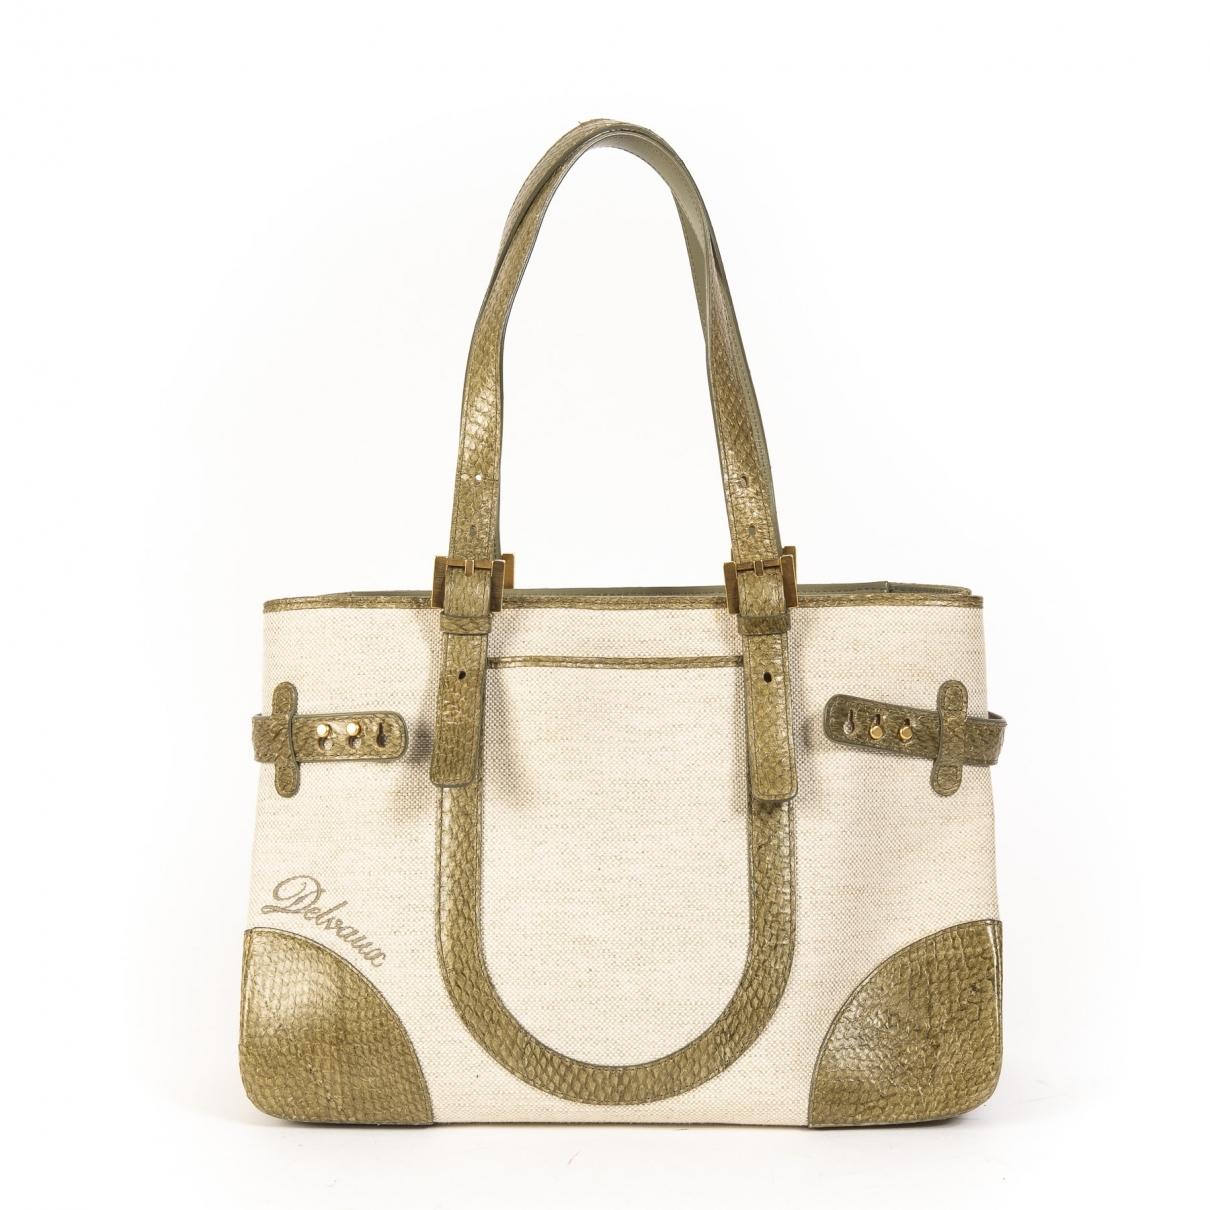 Delvaux \N Beige Cloth handbag for Women \N